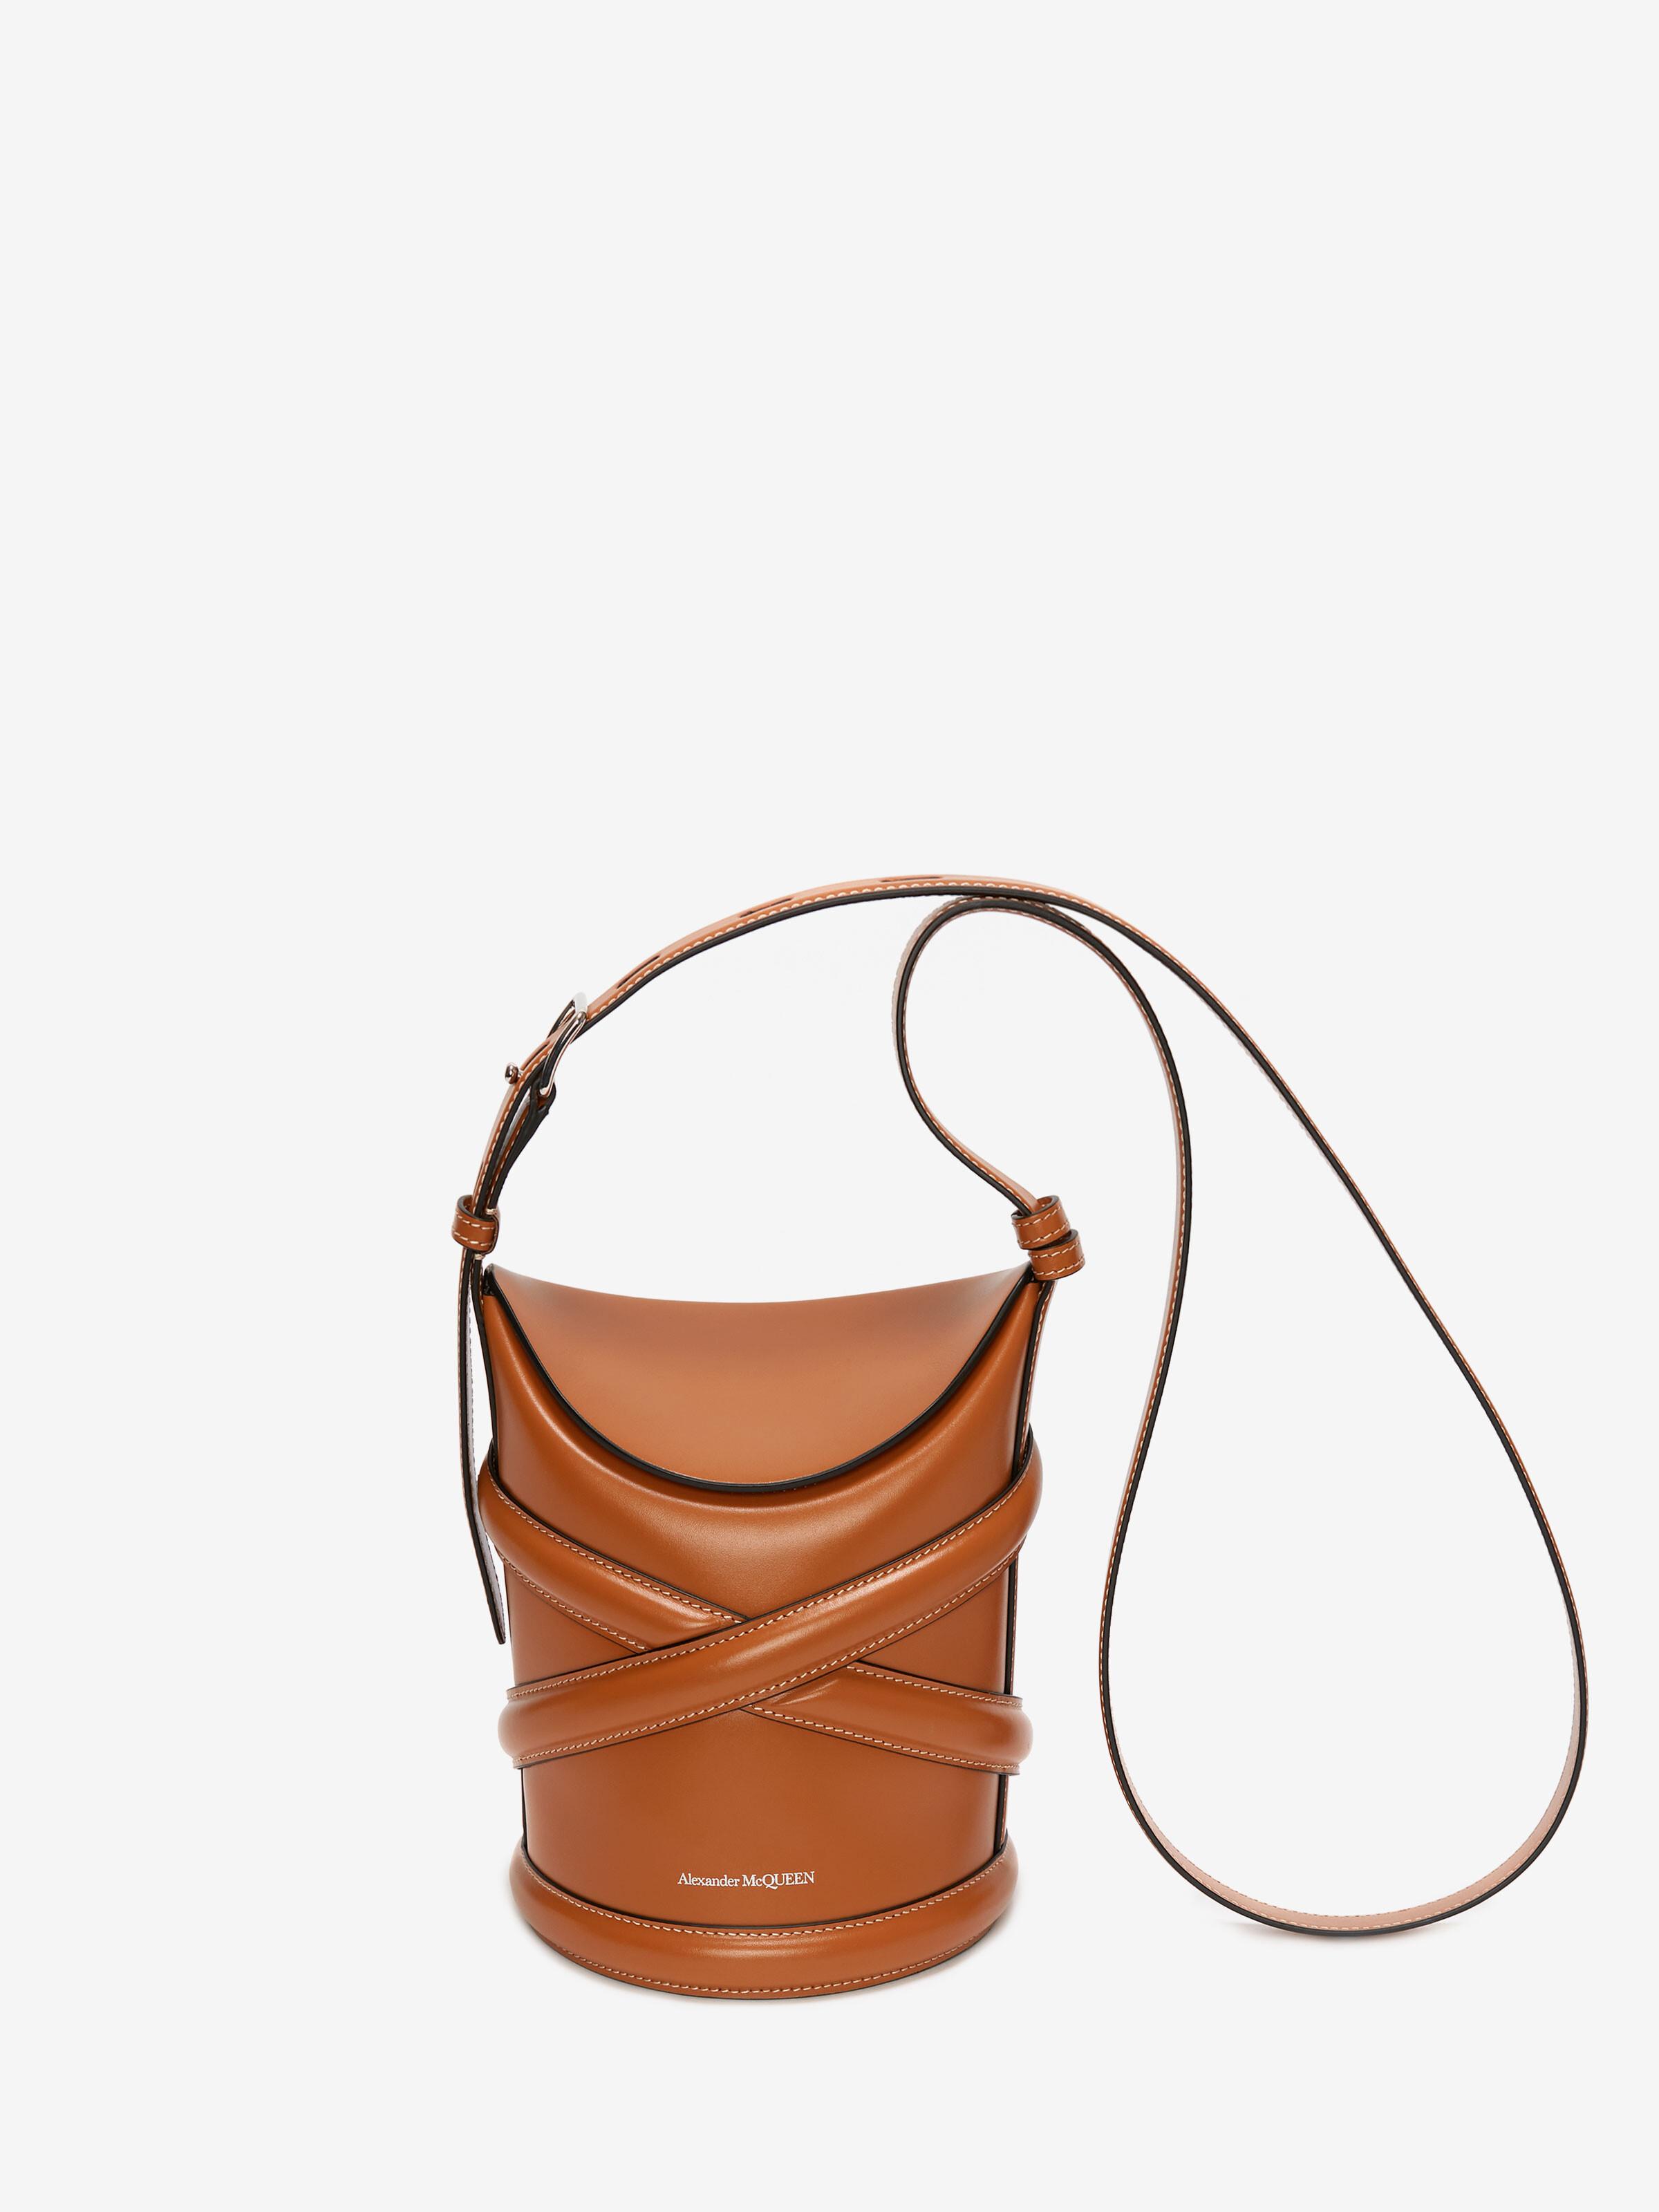 Alexander Mcqueen Brown The Curve Leather Bucket Bag